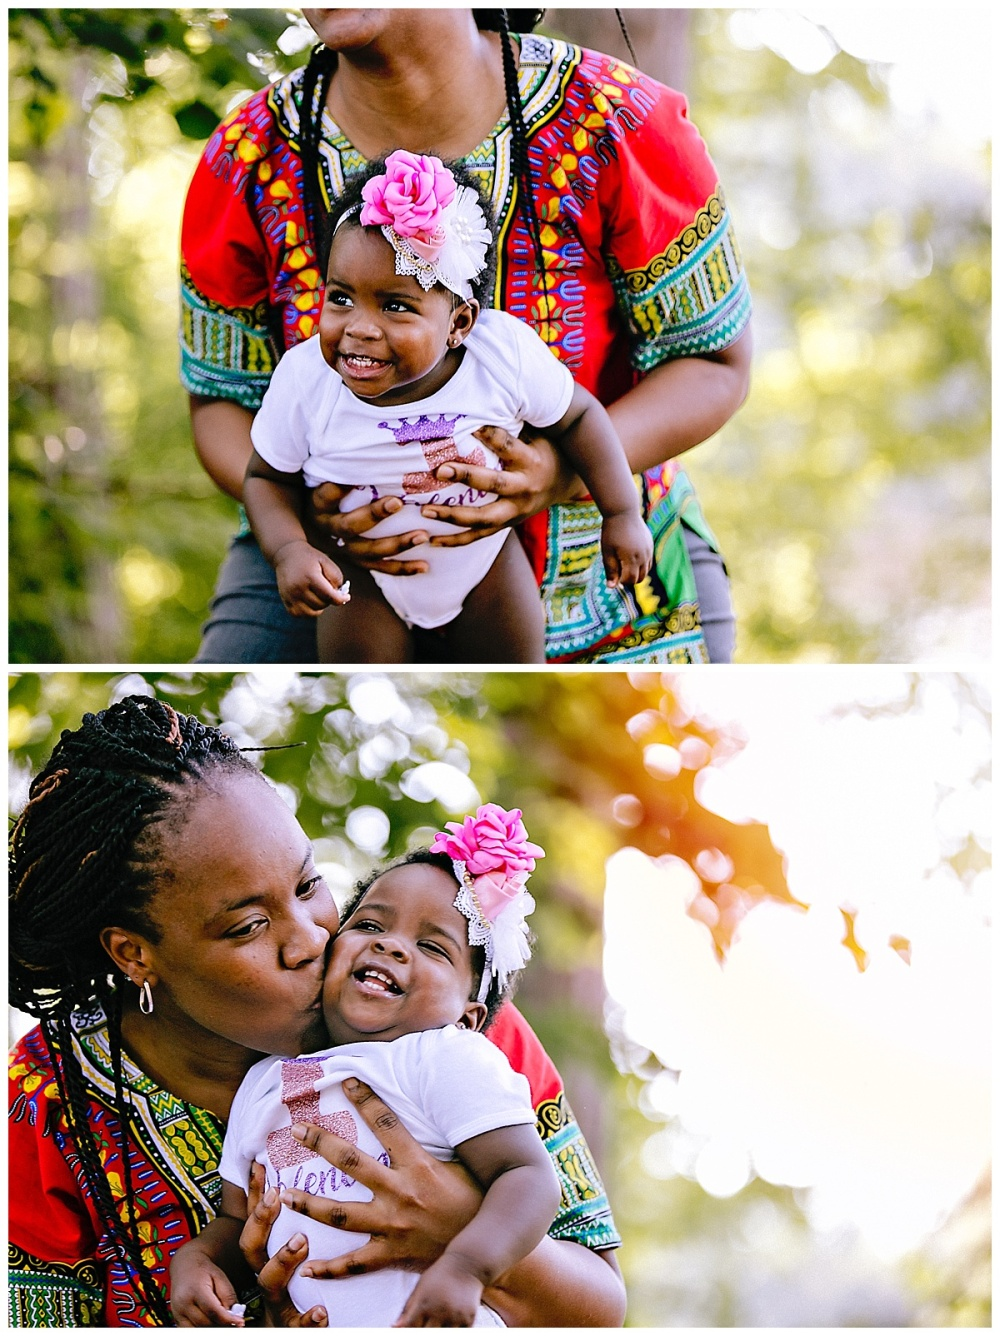 Carly-Barton-Photography-Family-Session-Kilgore-Texas-Twins-1-year-birthday-cake-smash-Olowo-family-photos_0027.jpg